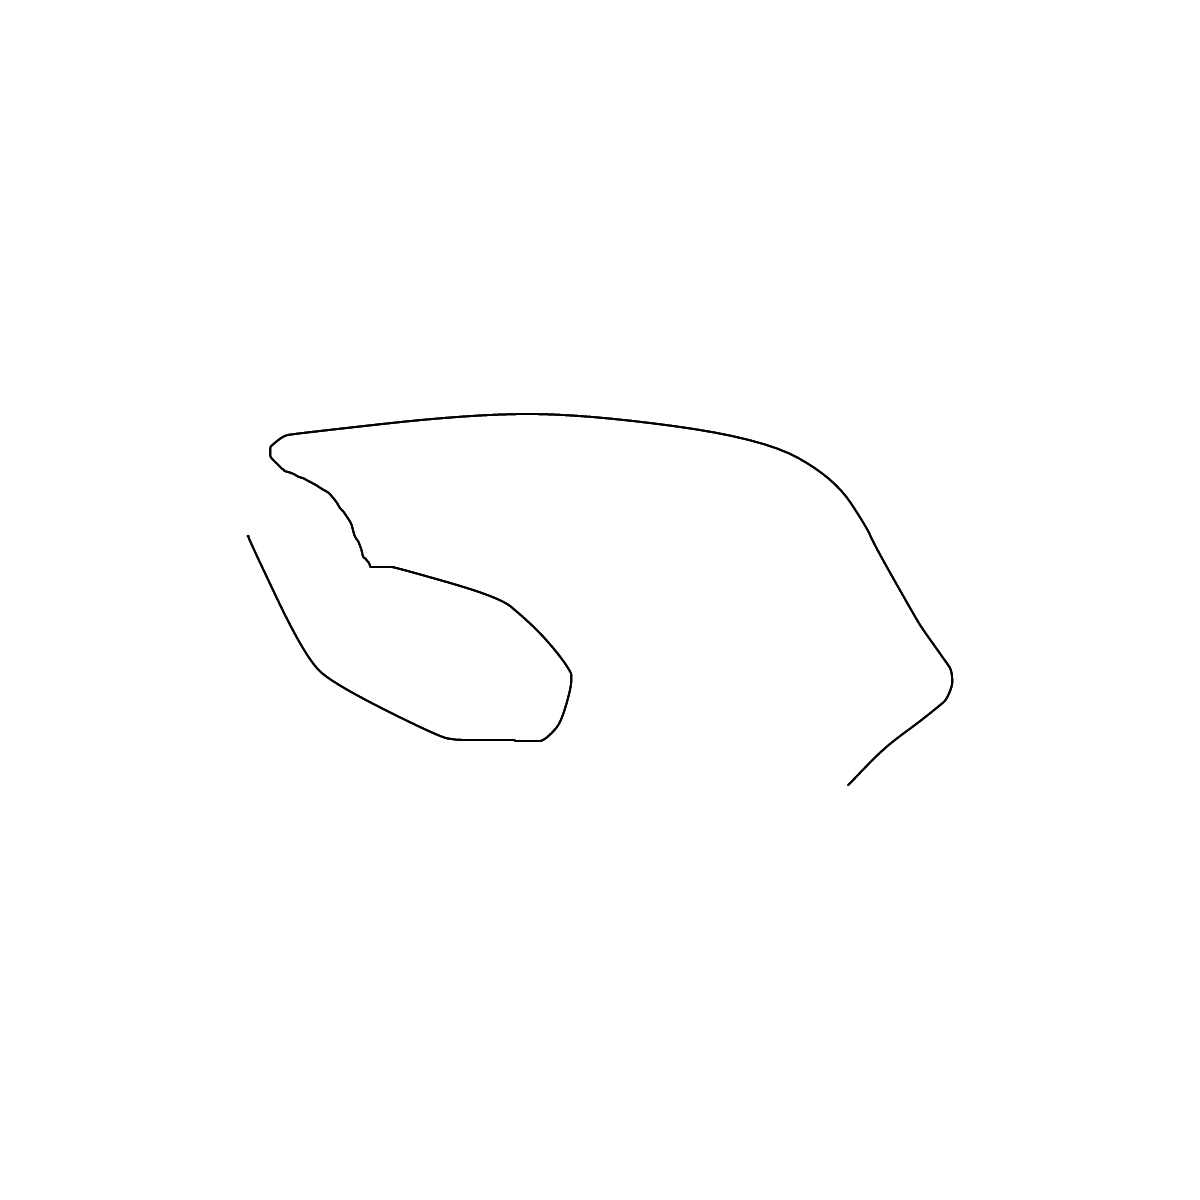 BAAAM drawing#8115 lat:39.4591598510742200lng: -0.3864299654960632